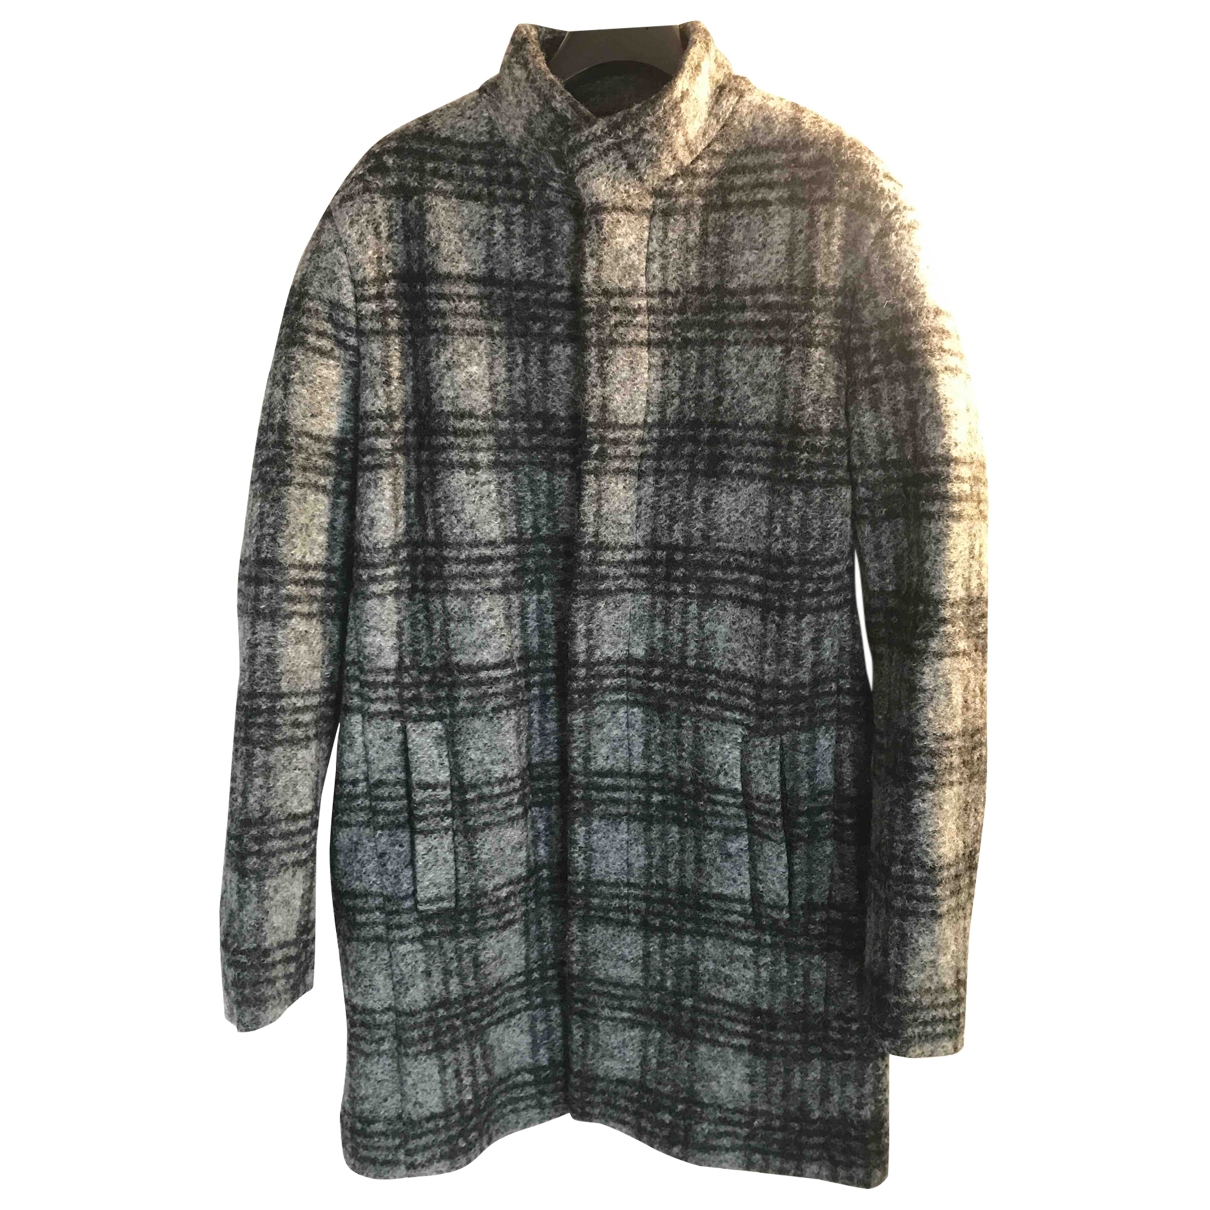 Zara \N Grey Wool coat  for Men M International